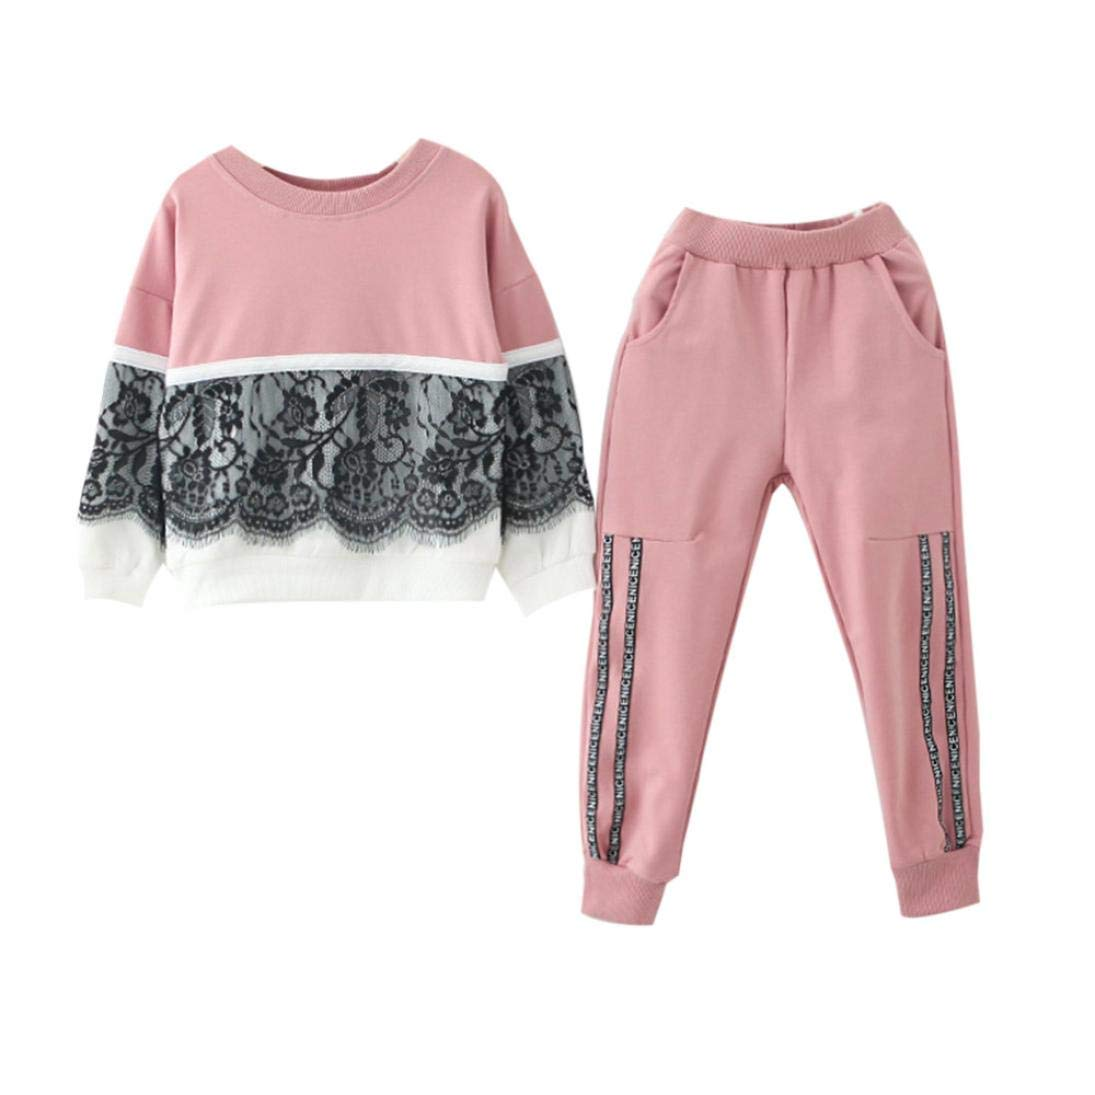 Niña 18 Meses ropa Body niño Completini para niños ropa 0 - 24 ...